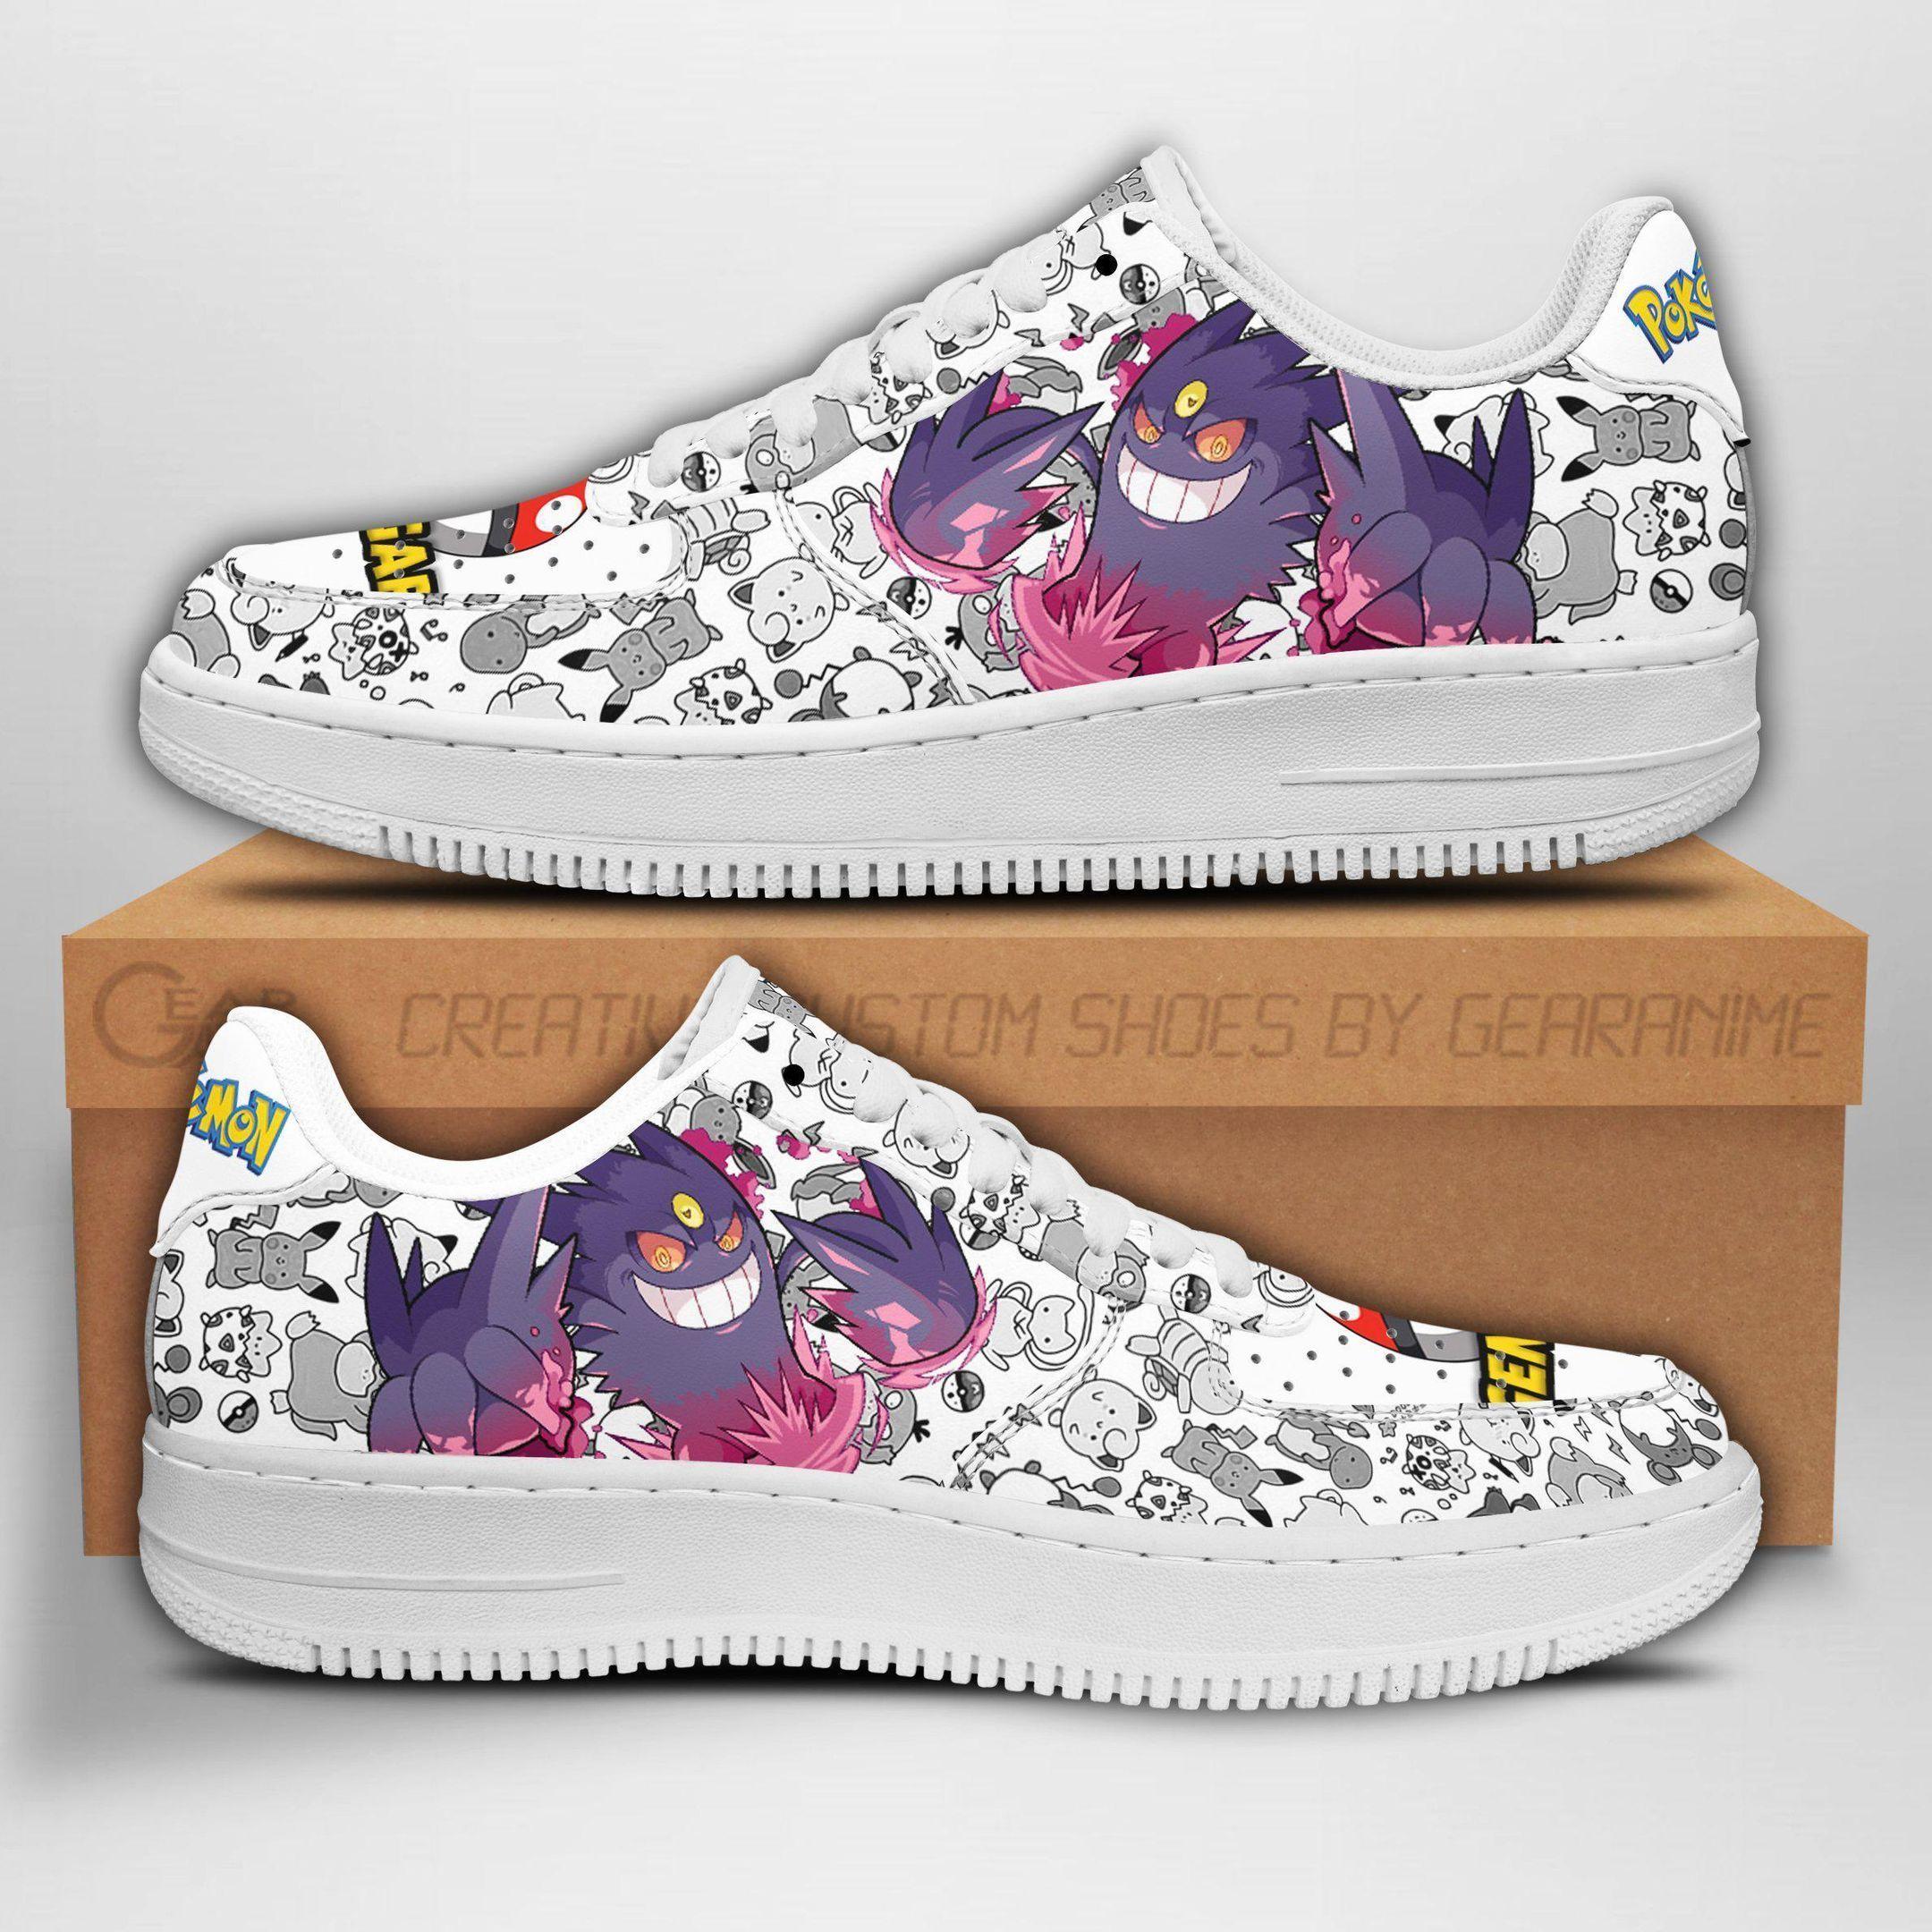 Gengar Air Shoes Pokemon Shoes Fan Gift Idea GO1012